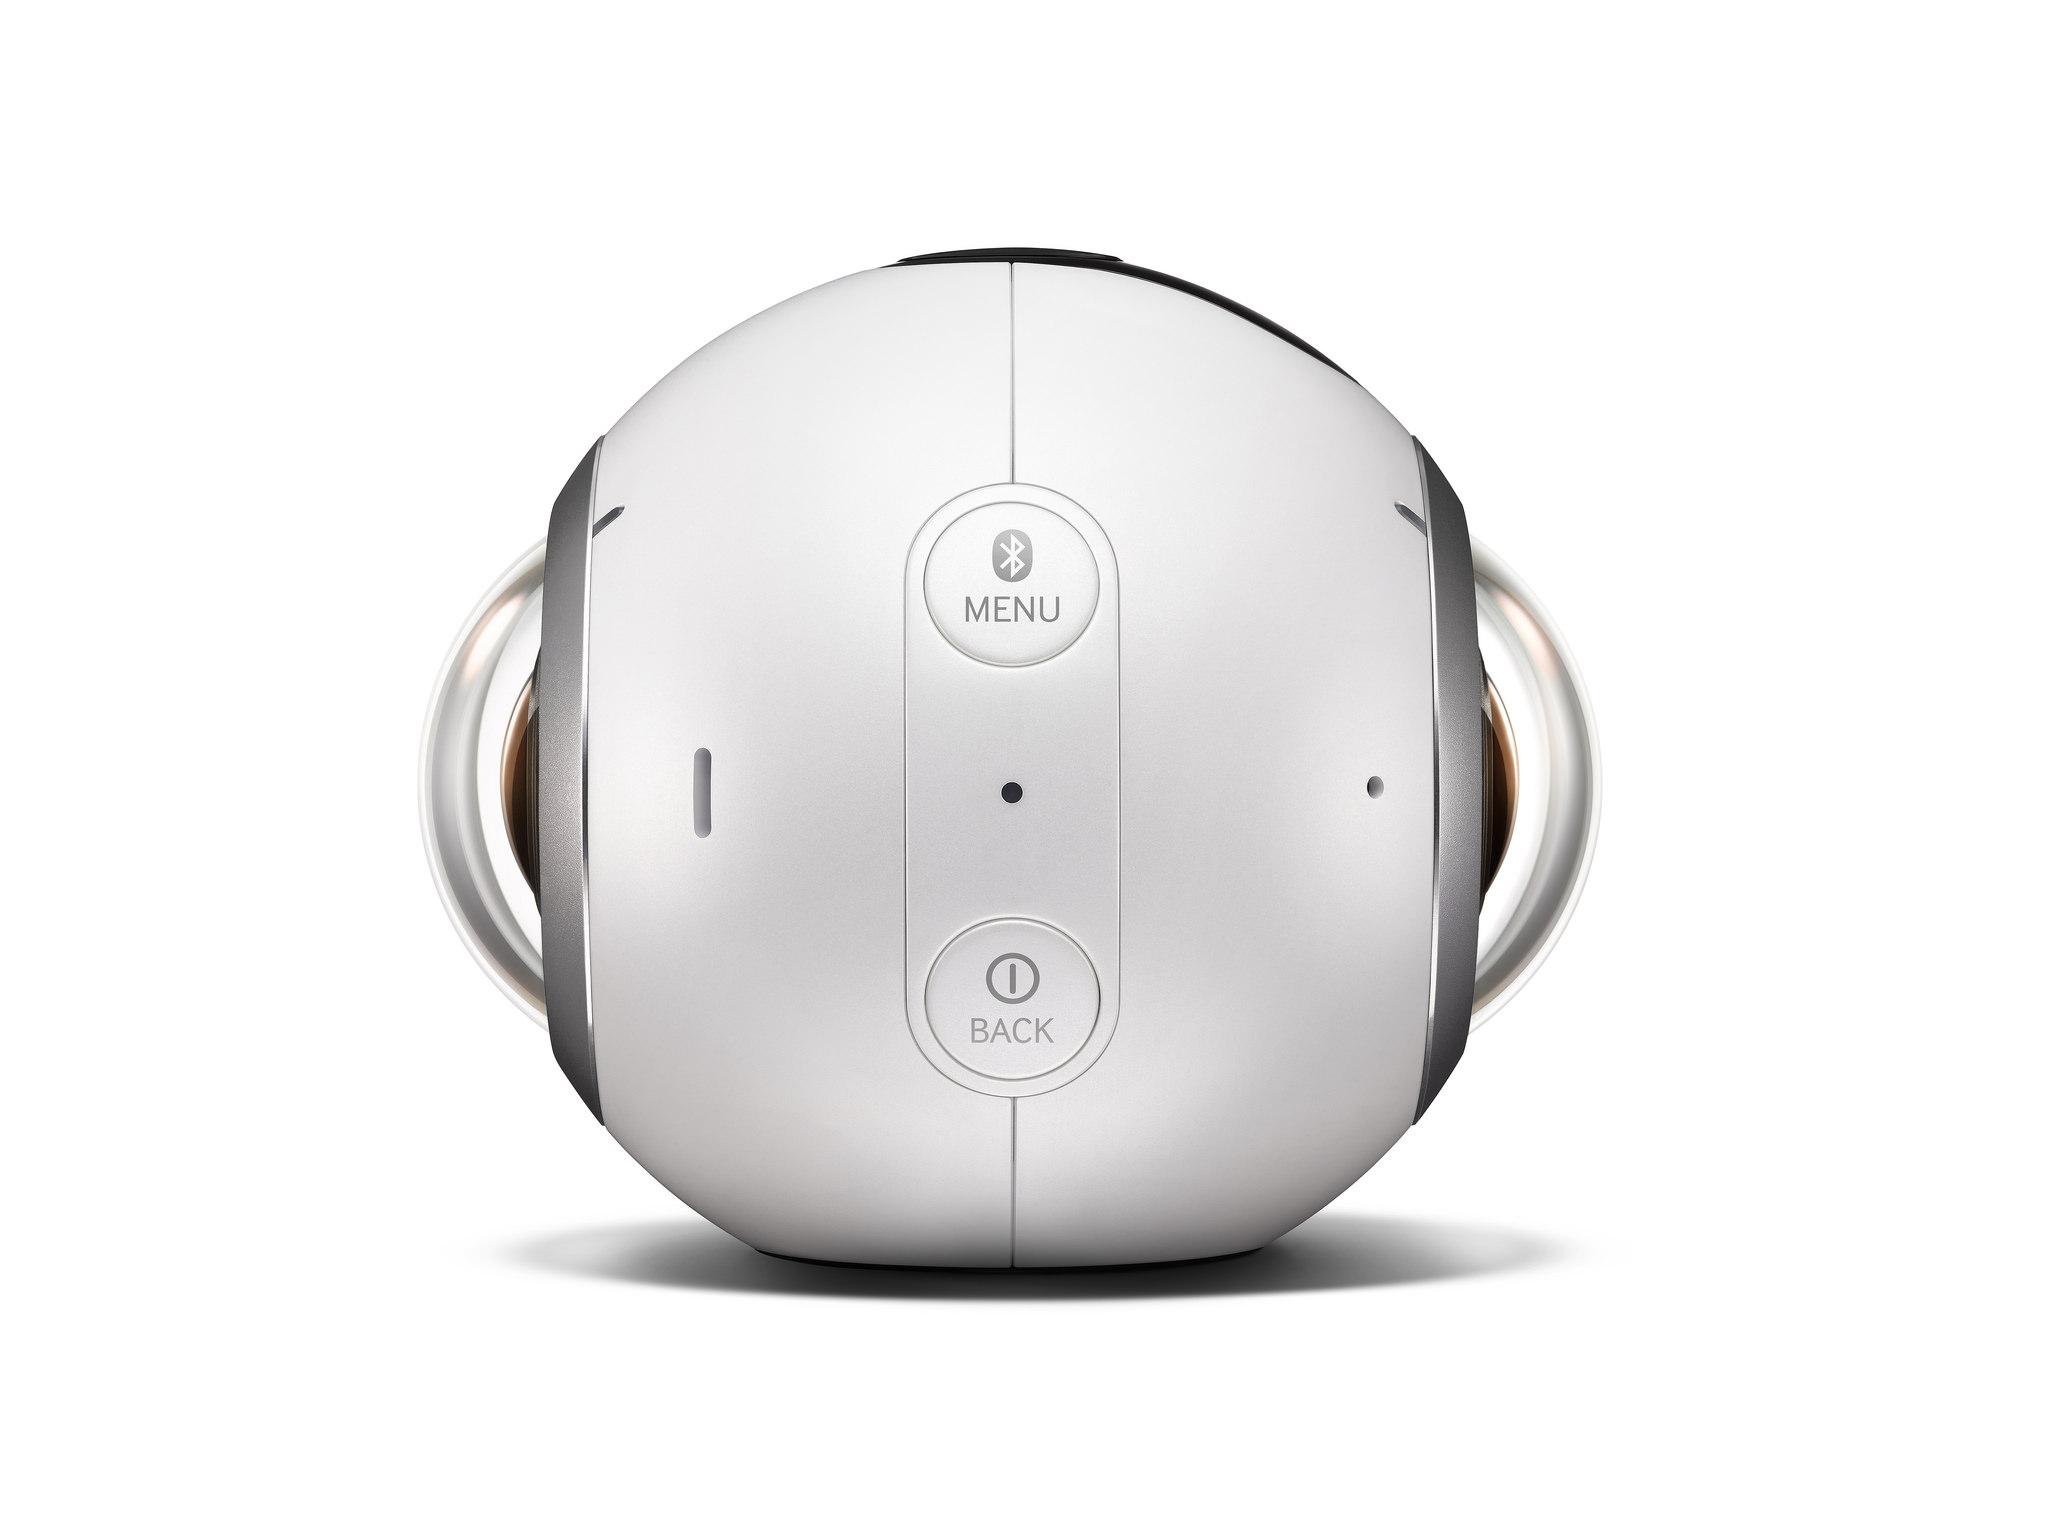 Samsung Gear 360 pulsanti